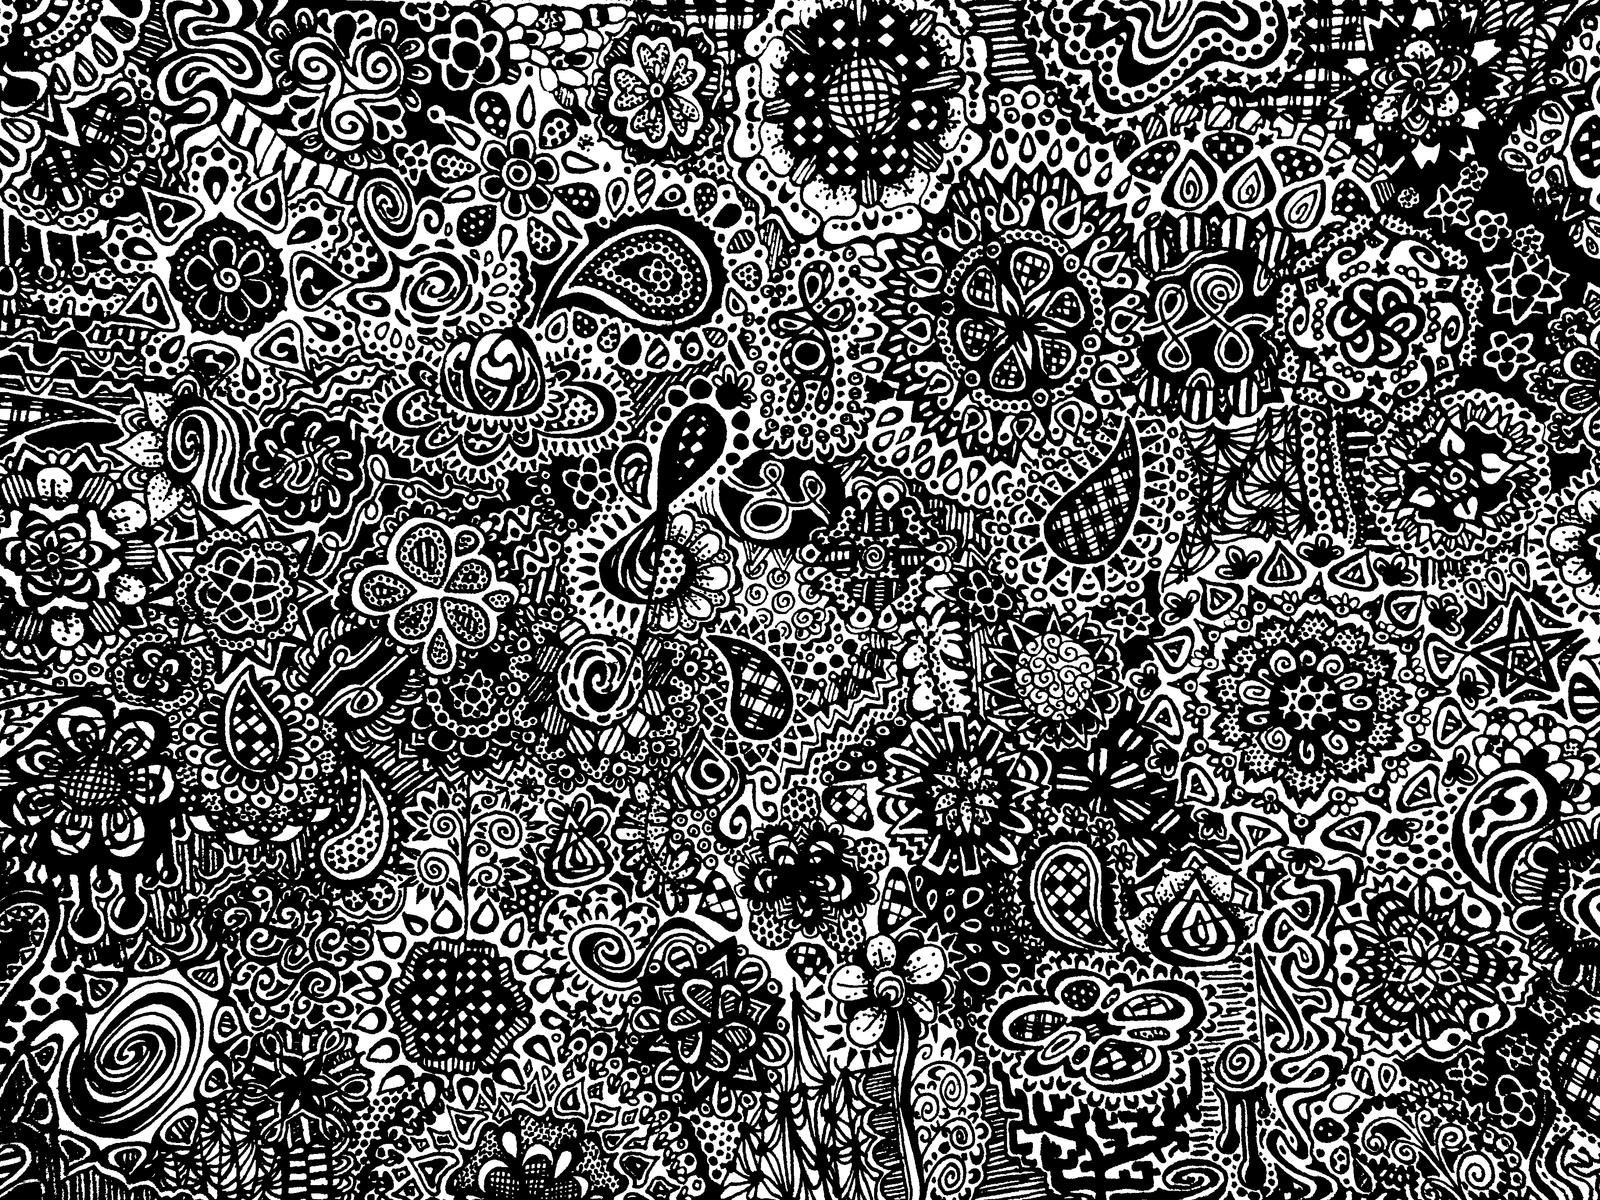 Doodling time by epsilonya on DeviantArt